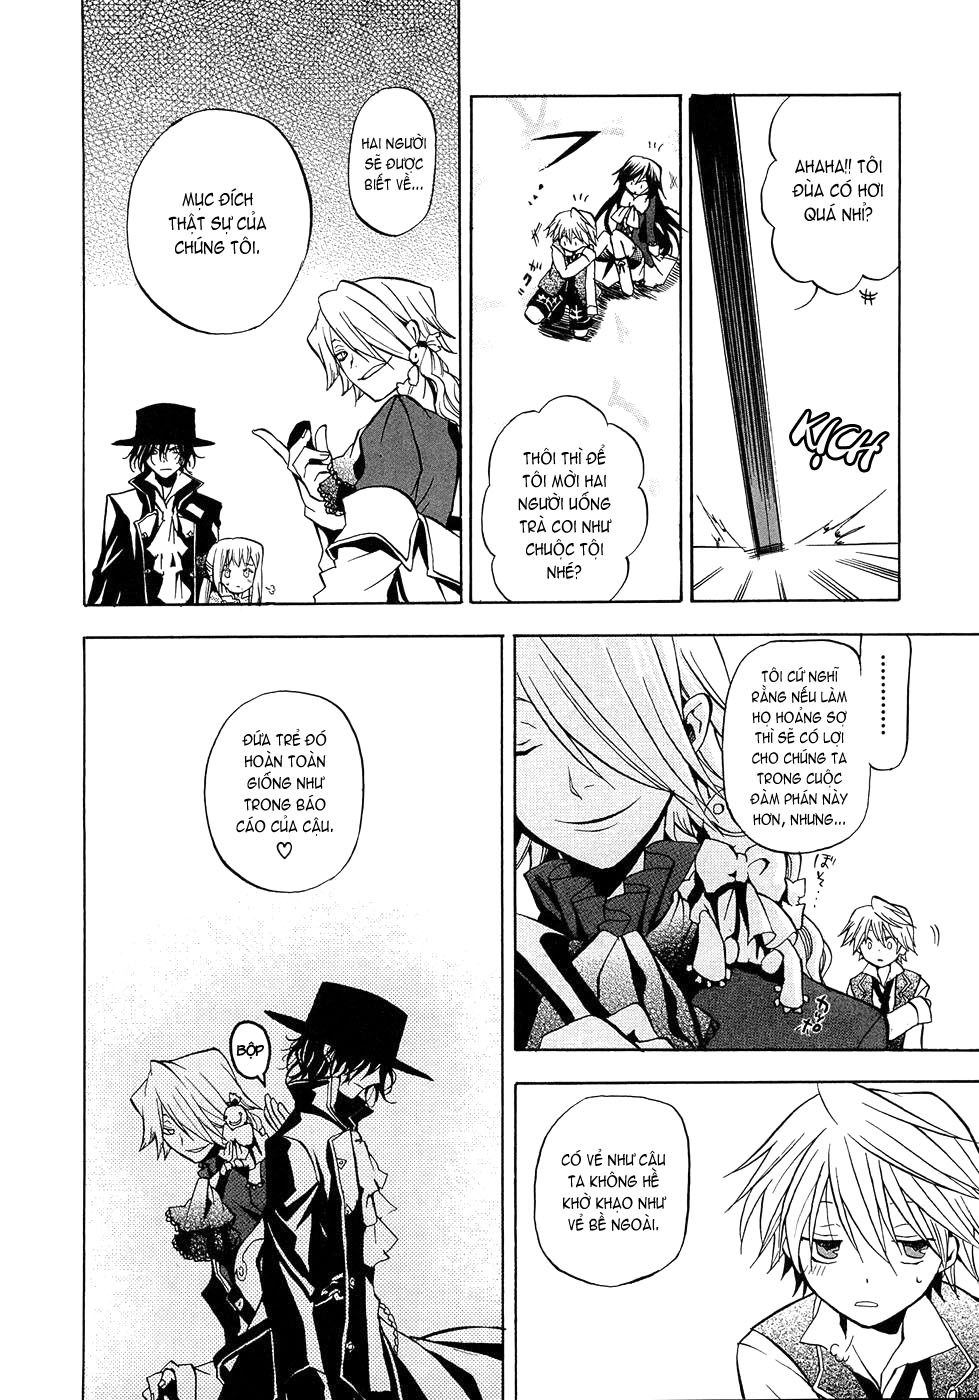 Pandora Hearts chương 004 - retrace: iv rendezvous trang 24